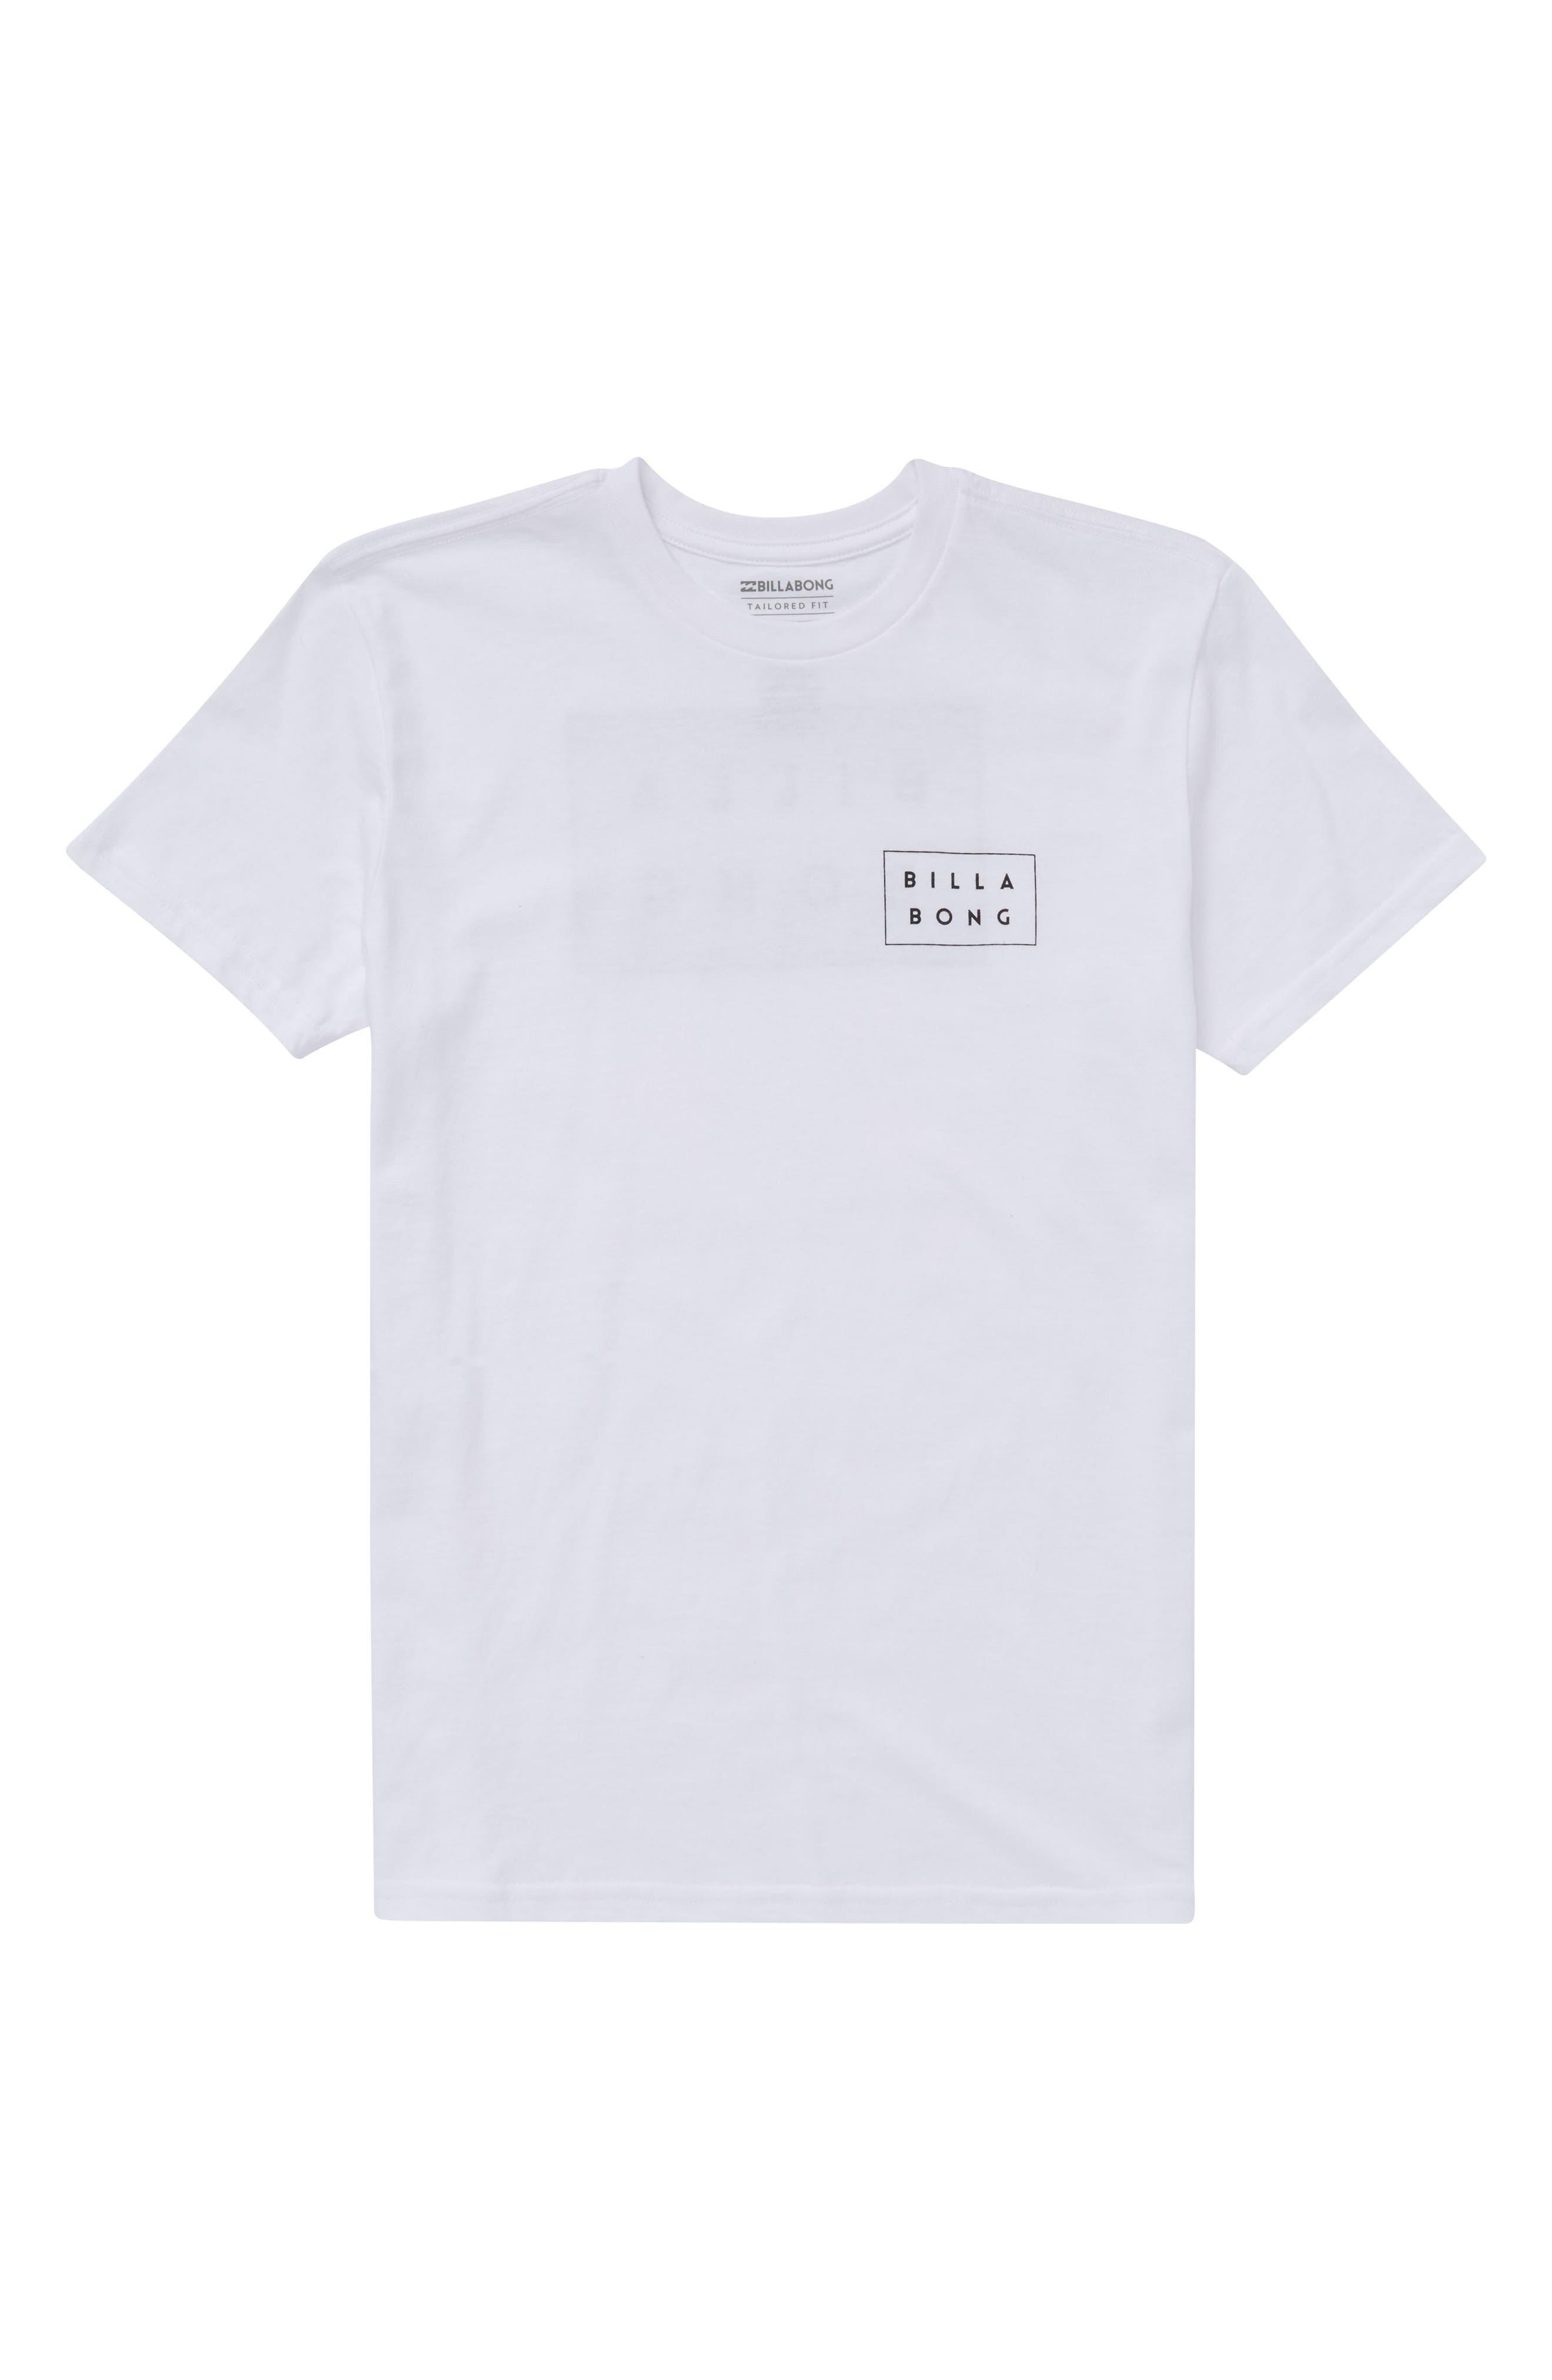 Die Cut Graphic T-Shirt,                         Main,                         color, White